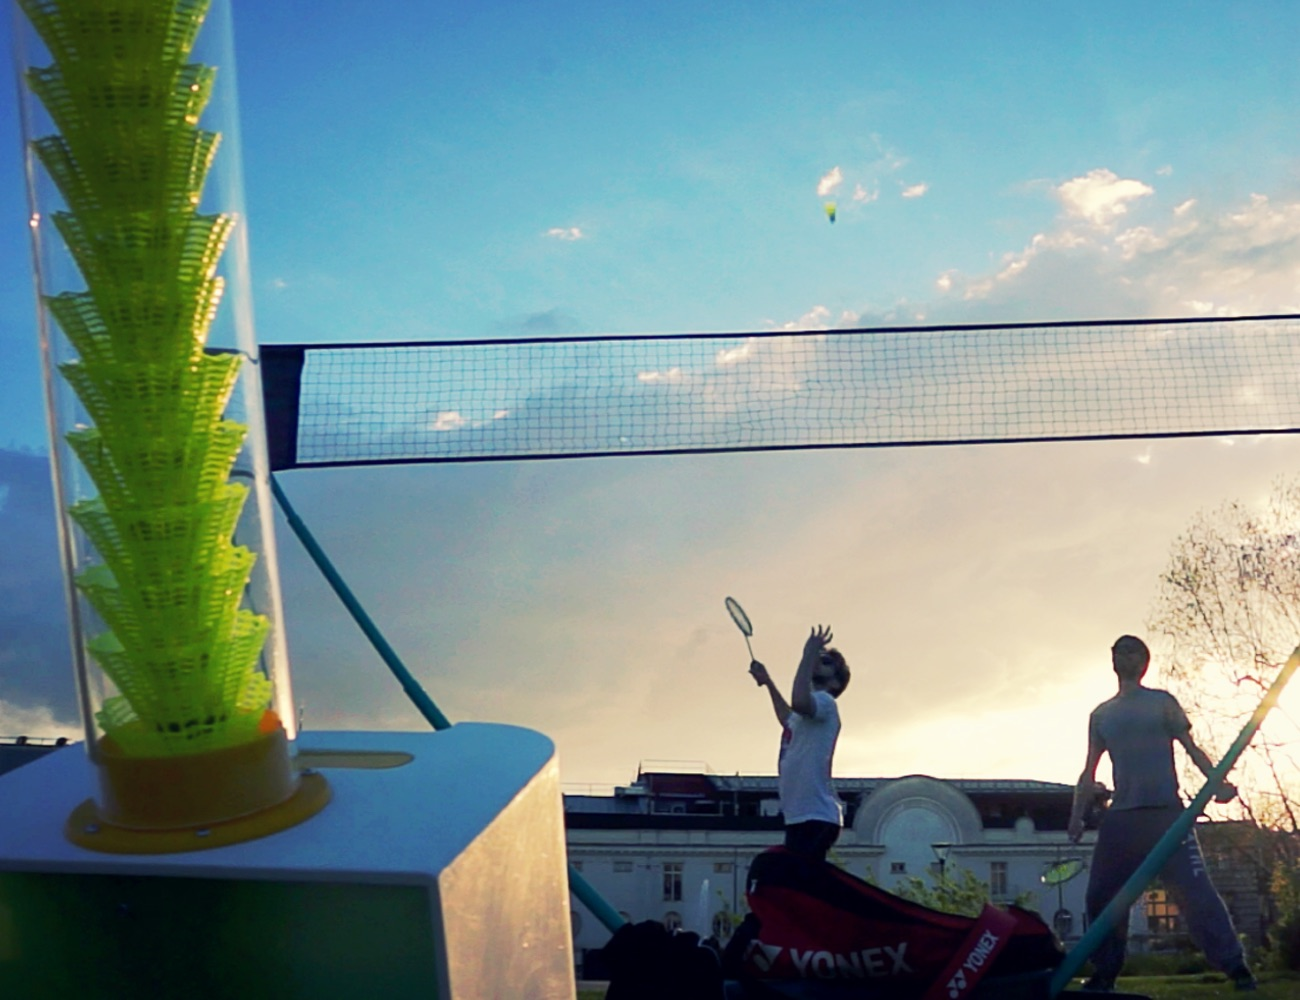 BADDY Open Source Badminton Robot